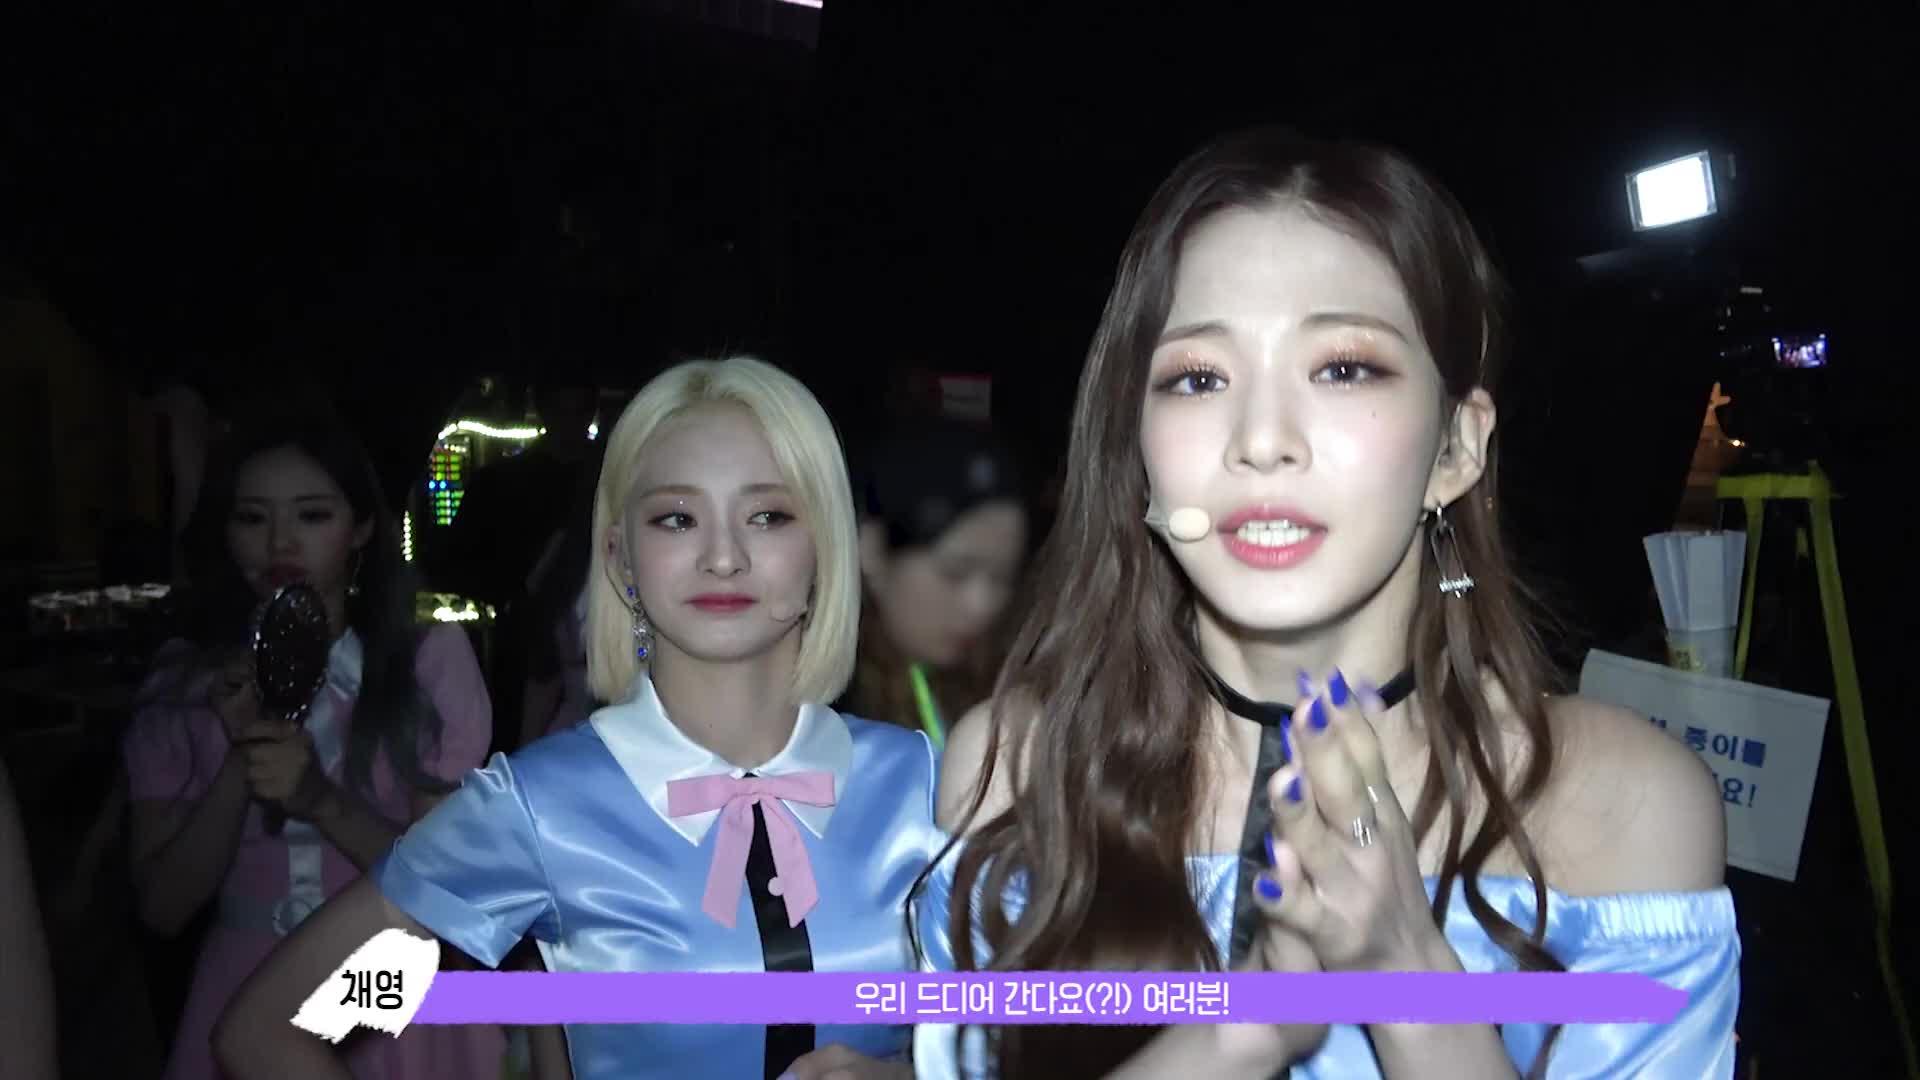 chaeyoung, fromis, jiheon, jiwon, nakyung, chaeyoung gets left hanging GIFs